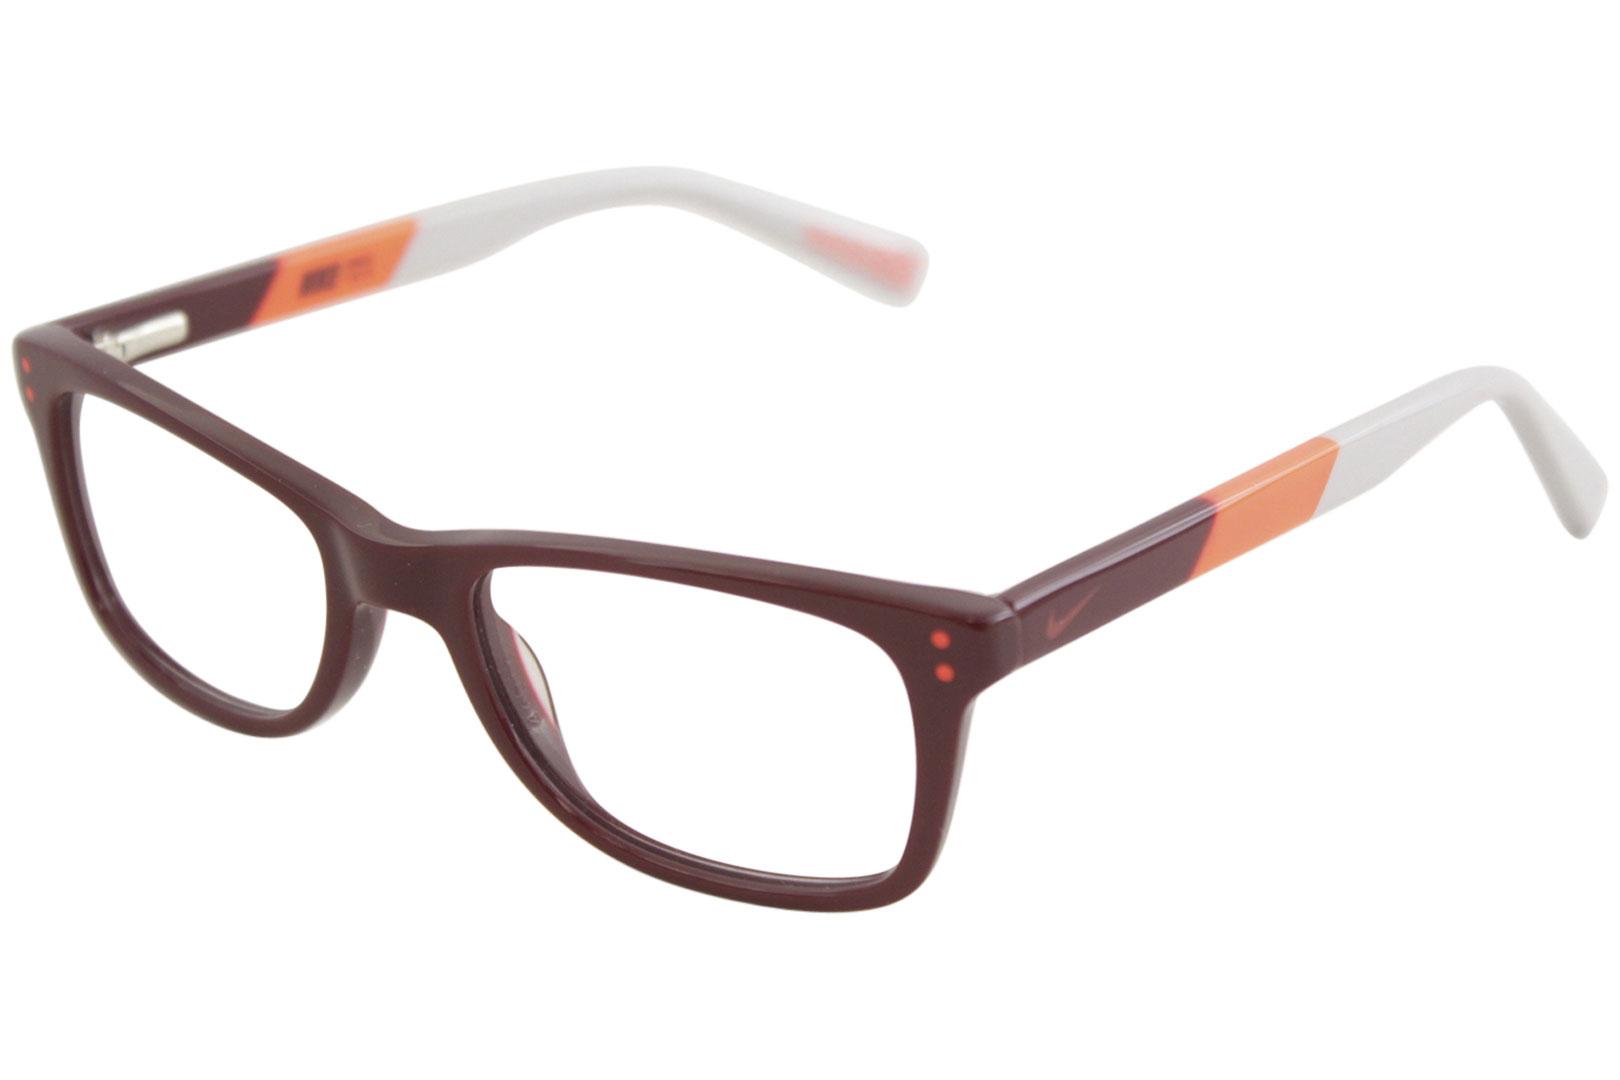 9fed63a2134 Nike Youth Boy s Eyeglasses 5538 605 Team Red Bright Crimson Optical ...